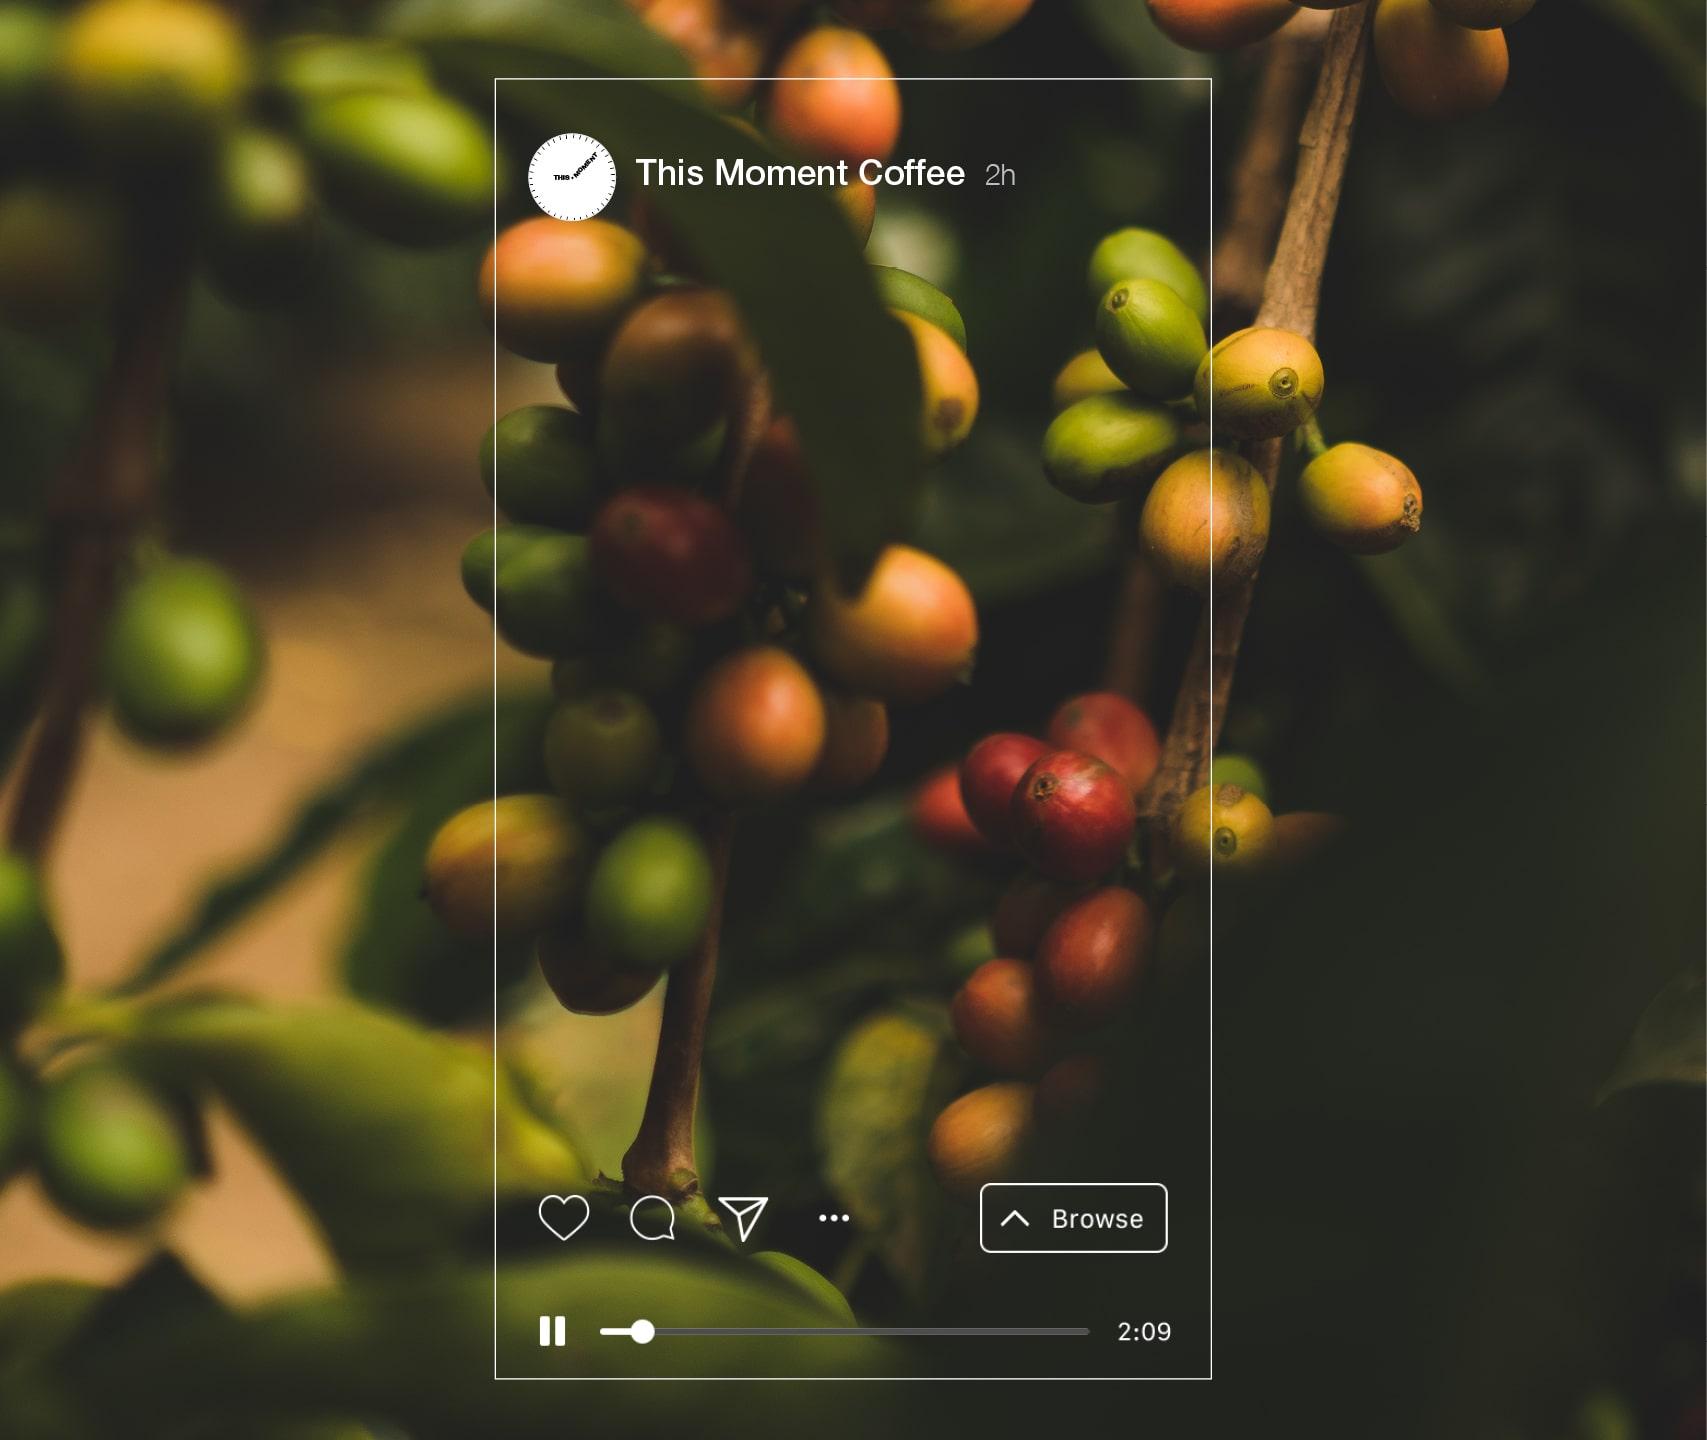 mantik-digital-branding-development-agency-creative-app-ui-web-branding-10-min-1